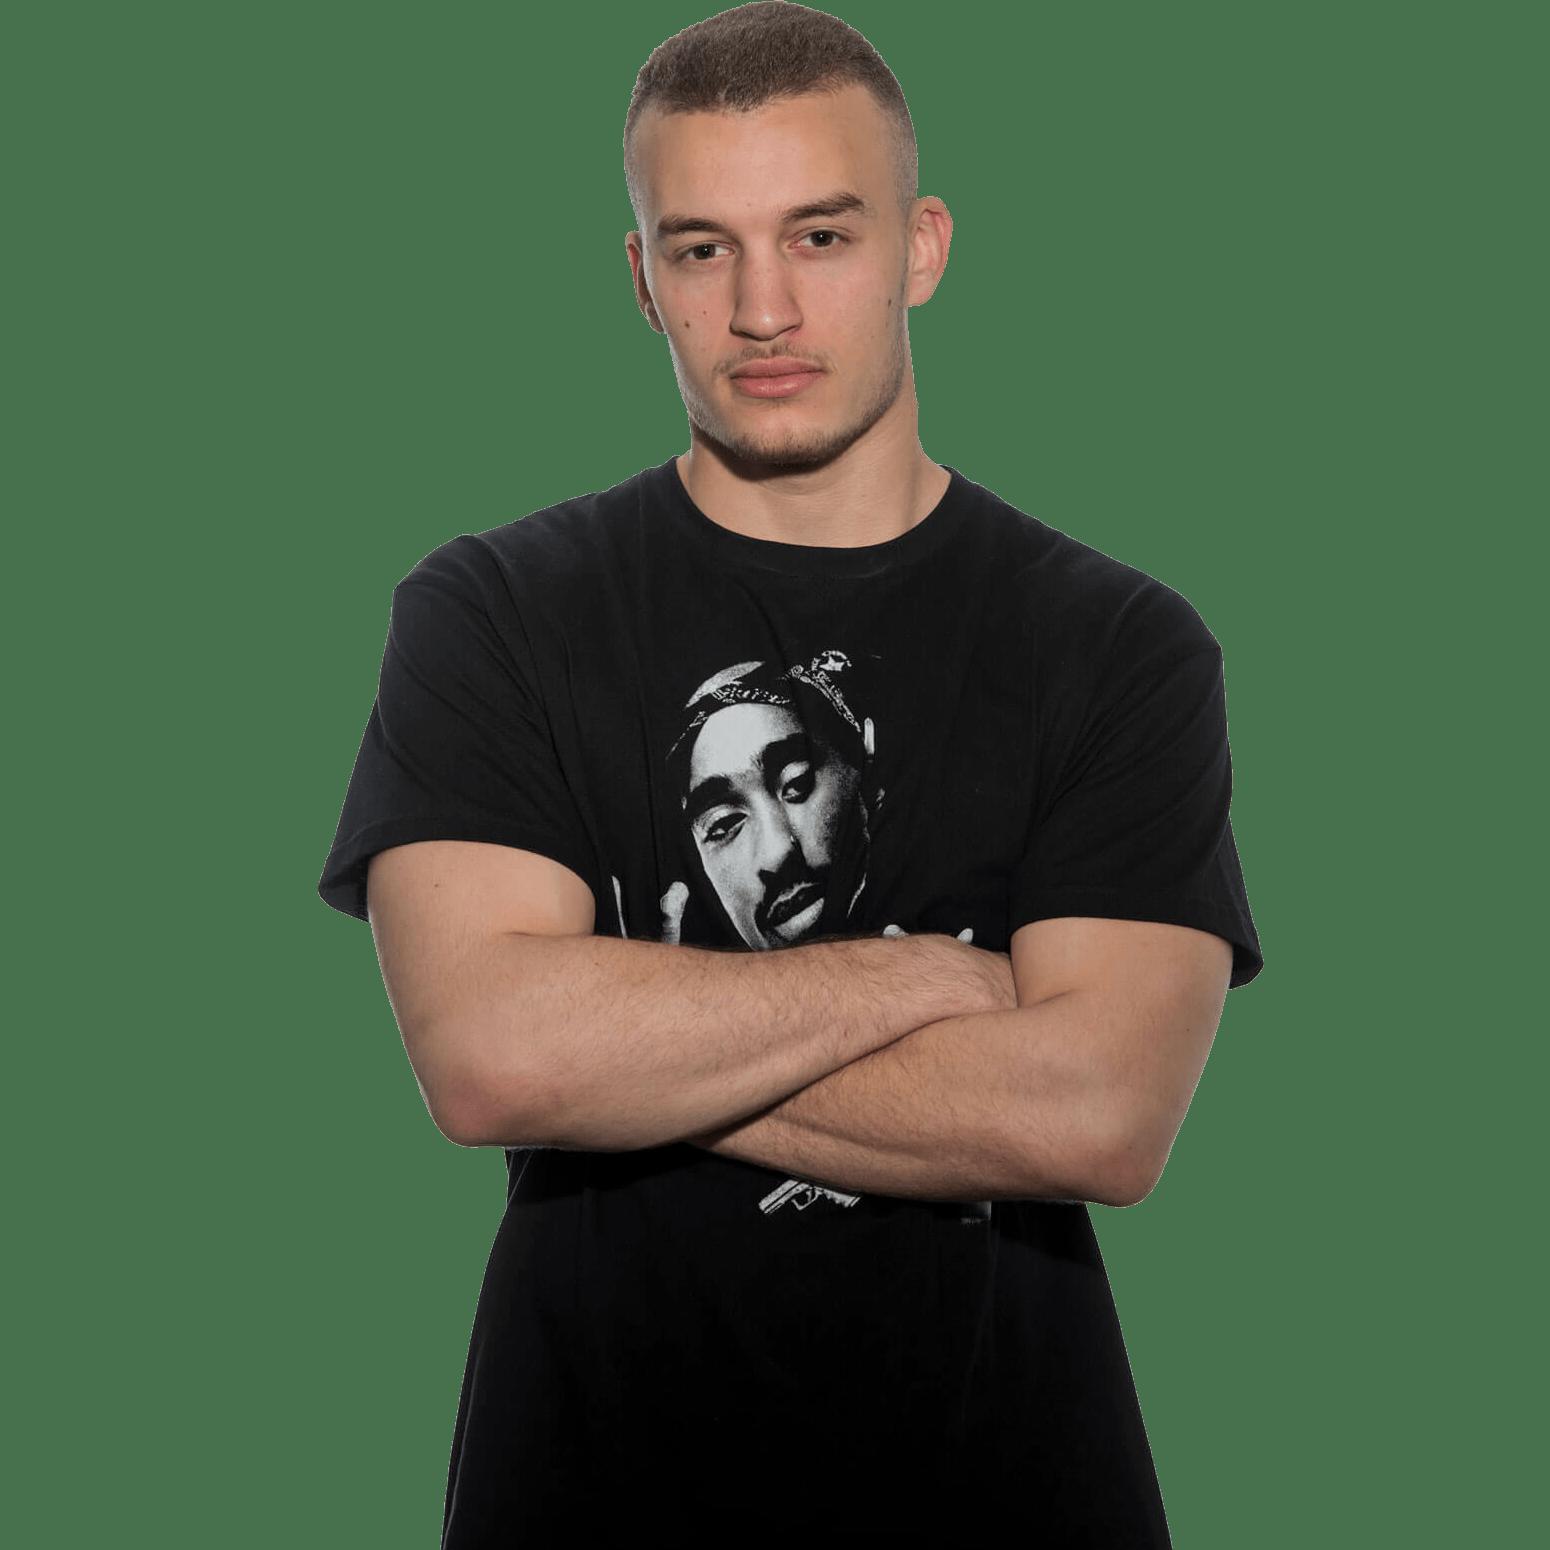 DJ-Fido-Stade-Person-verschraenkte-Arme-1500x1500